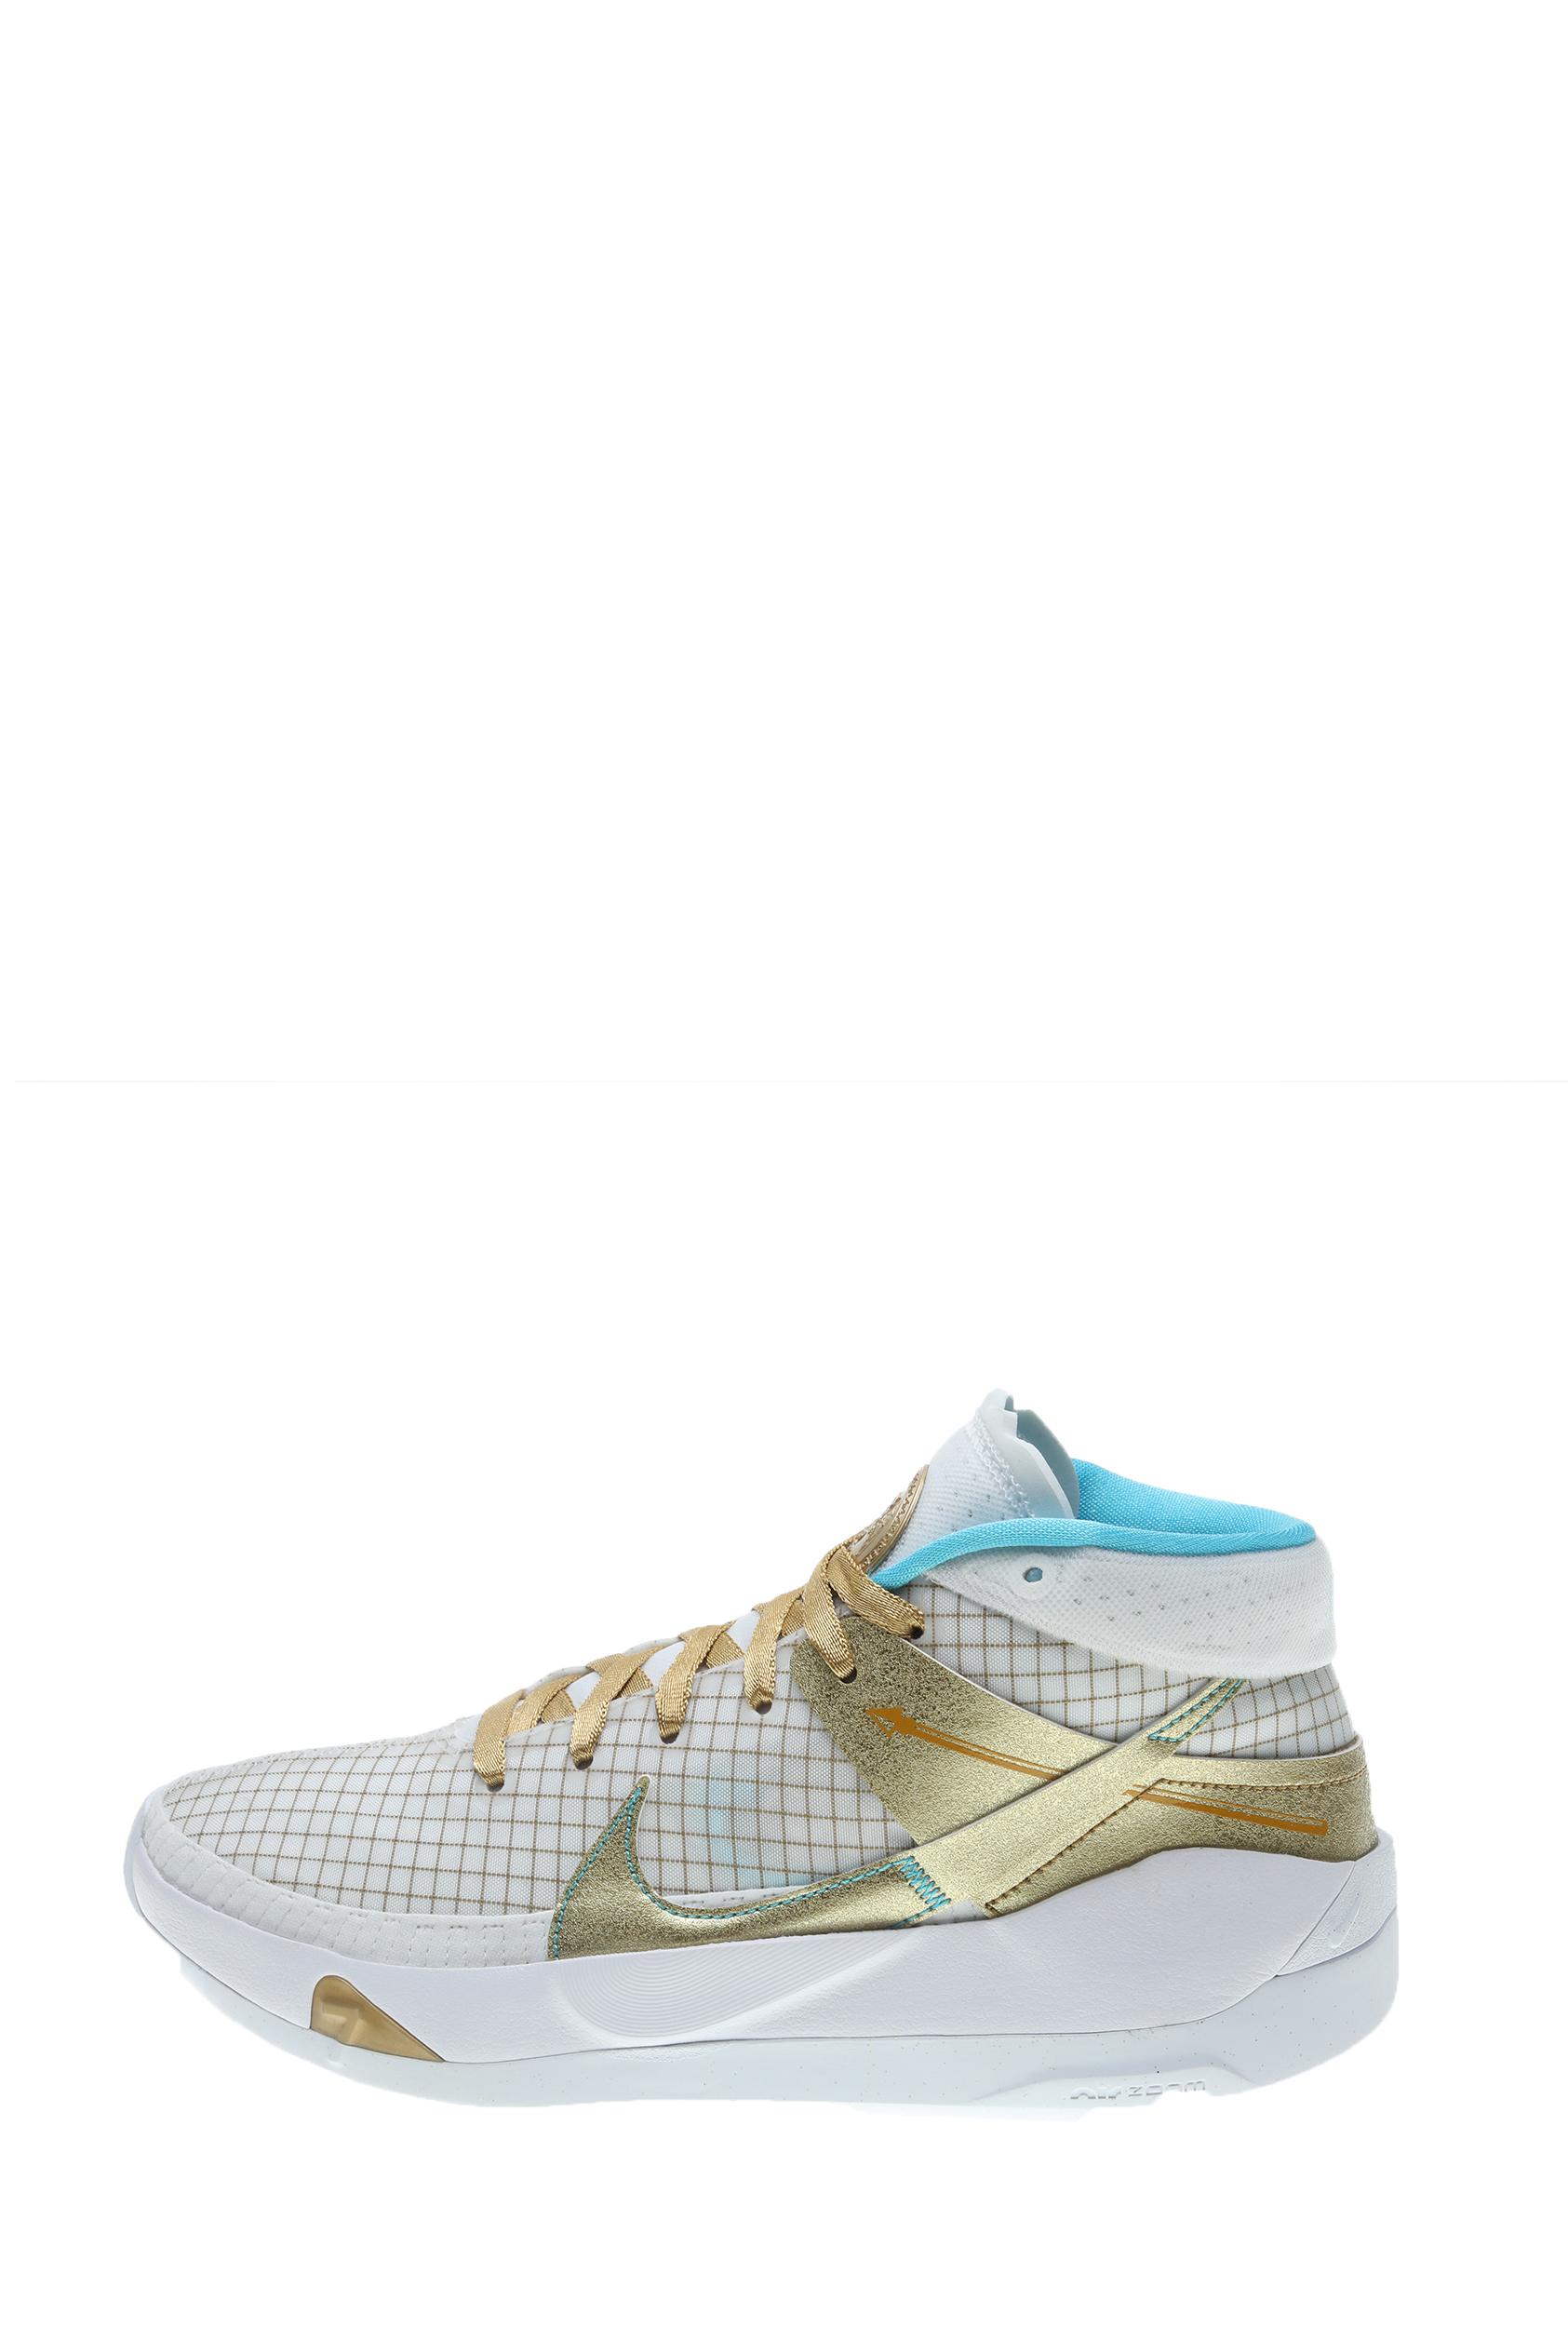 NIKE – Παπούτσι μπάσκετ KD13 λευκό χρυσό